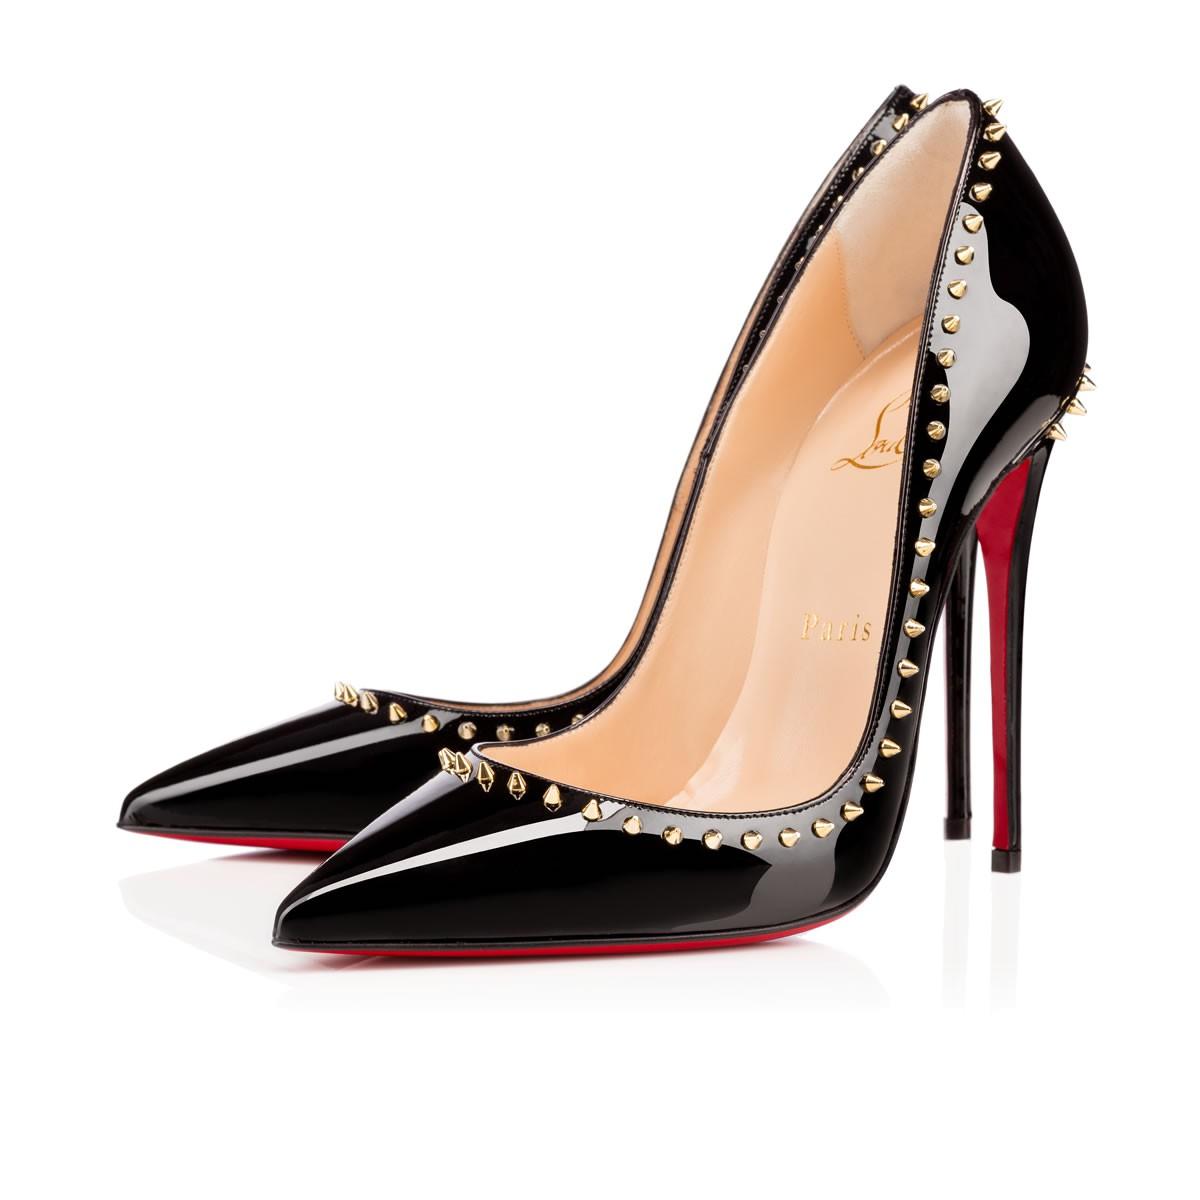 76c94b958a2f CHRISTIAN LOUBOUTIN ANJALINA 120MM BLACK PATENT - Reed Fashion Blog